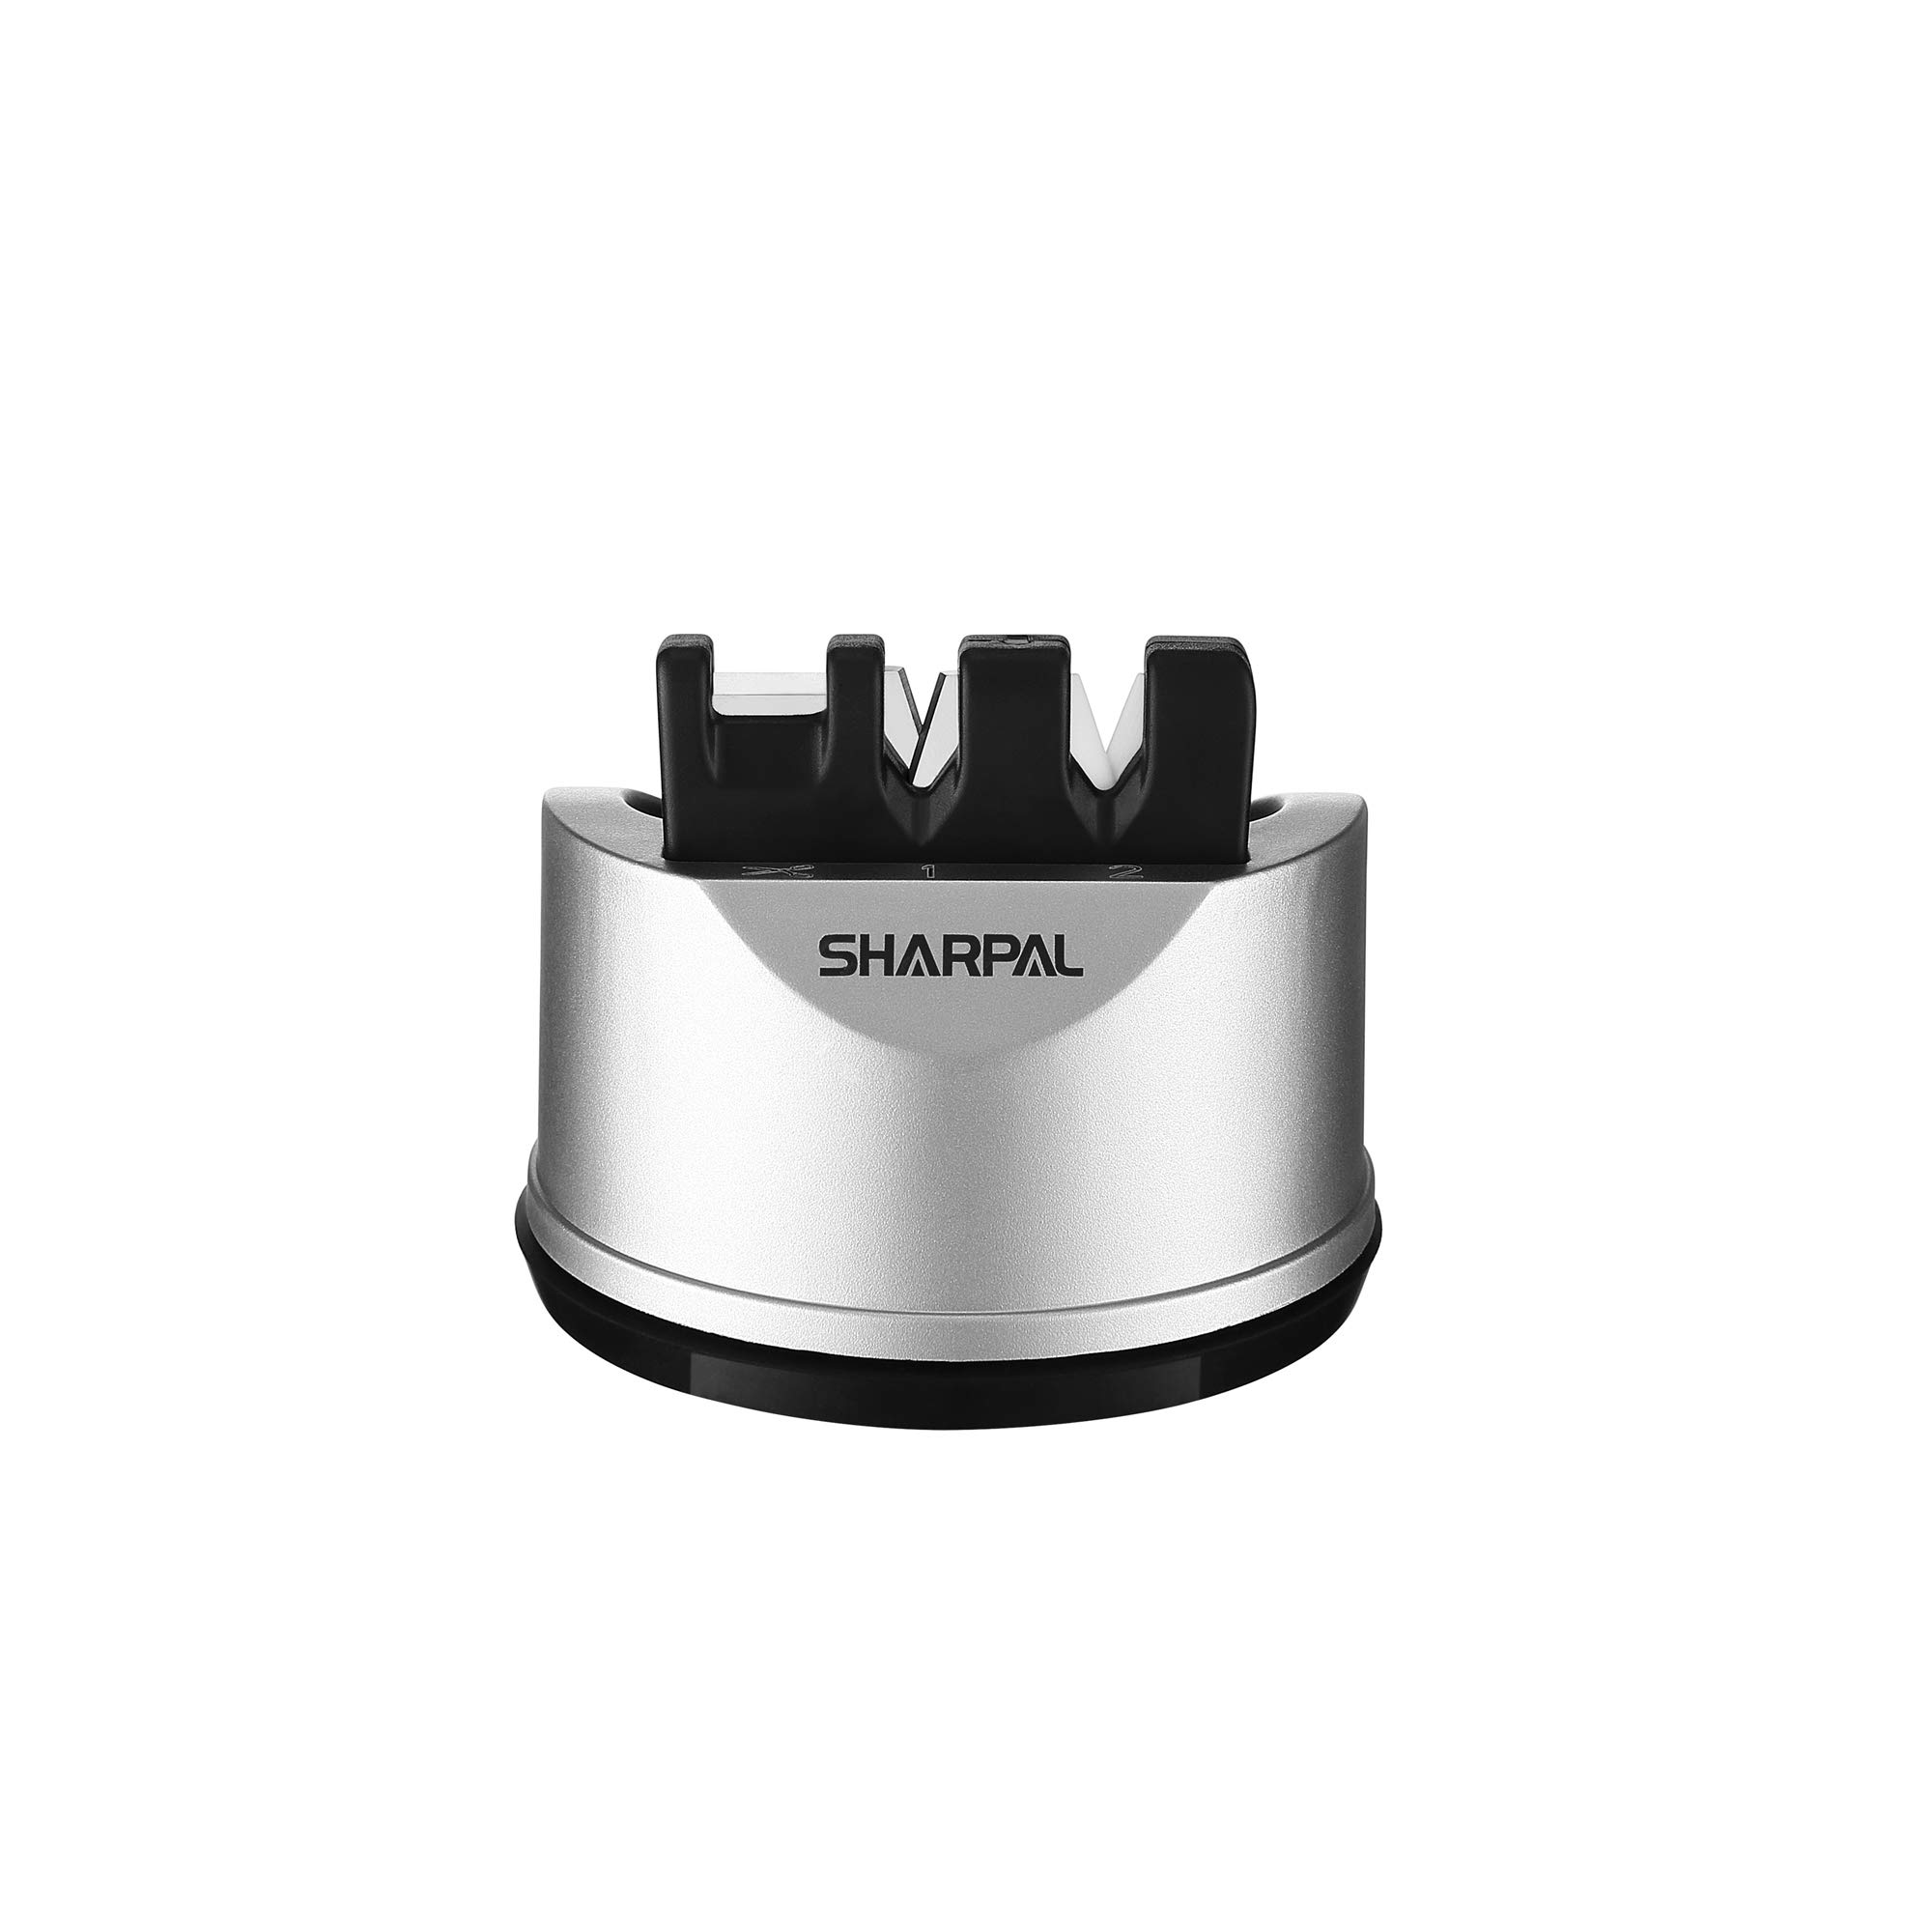 SHARPAL 191H Scissors Sharpener Sharpening